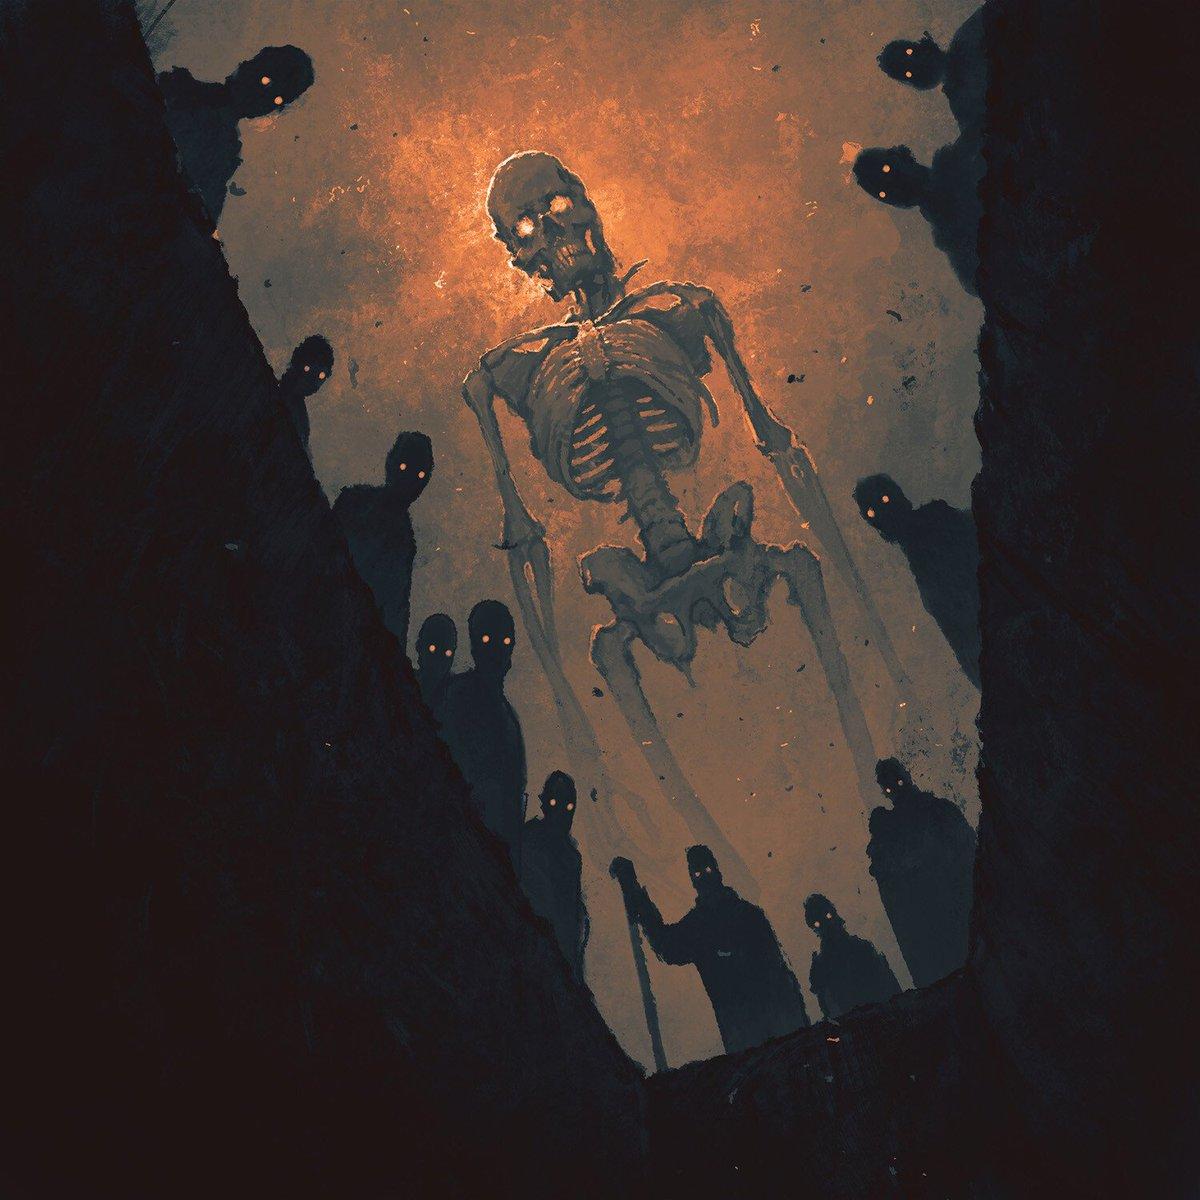 I Felt a Funeral in My Brain  #Art by Boris Groh <br>http://pic.twitter.com/mSjLCLOHDx